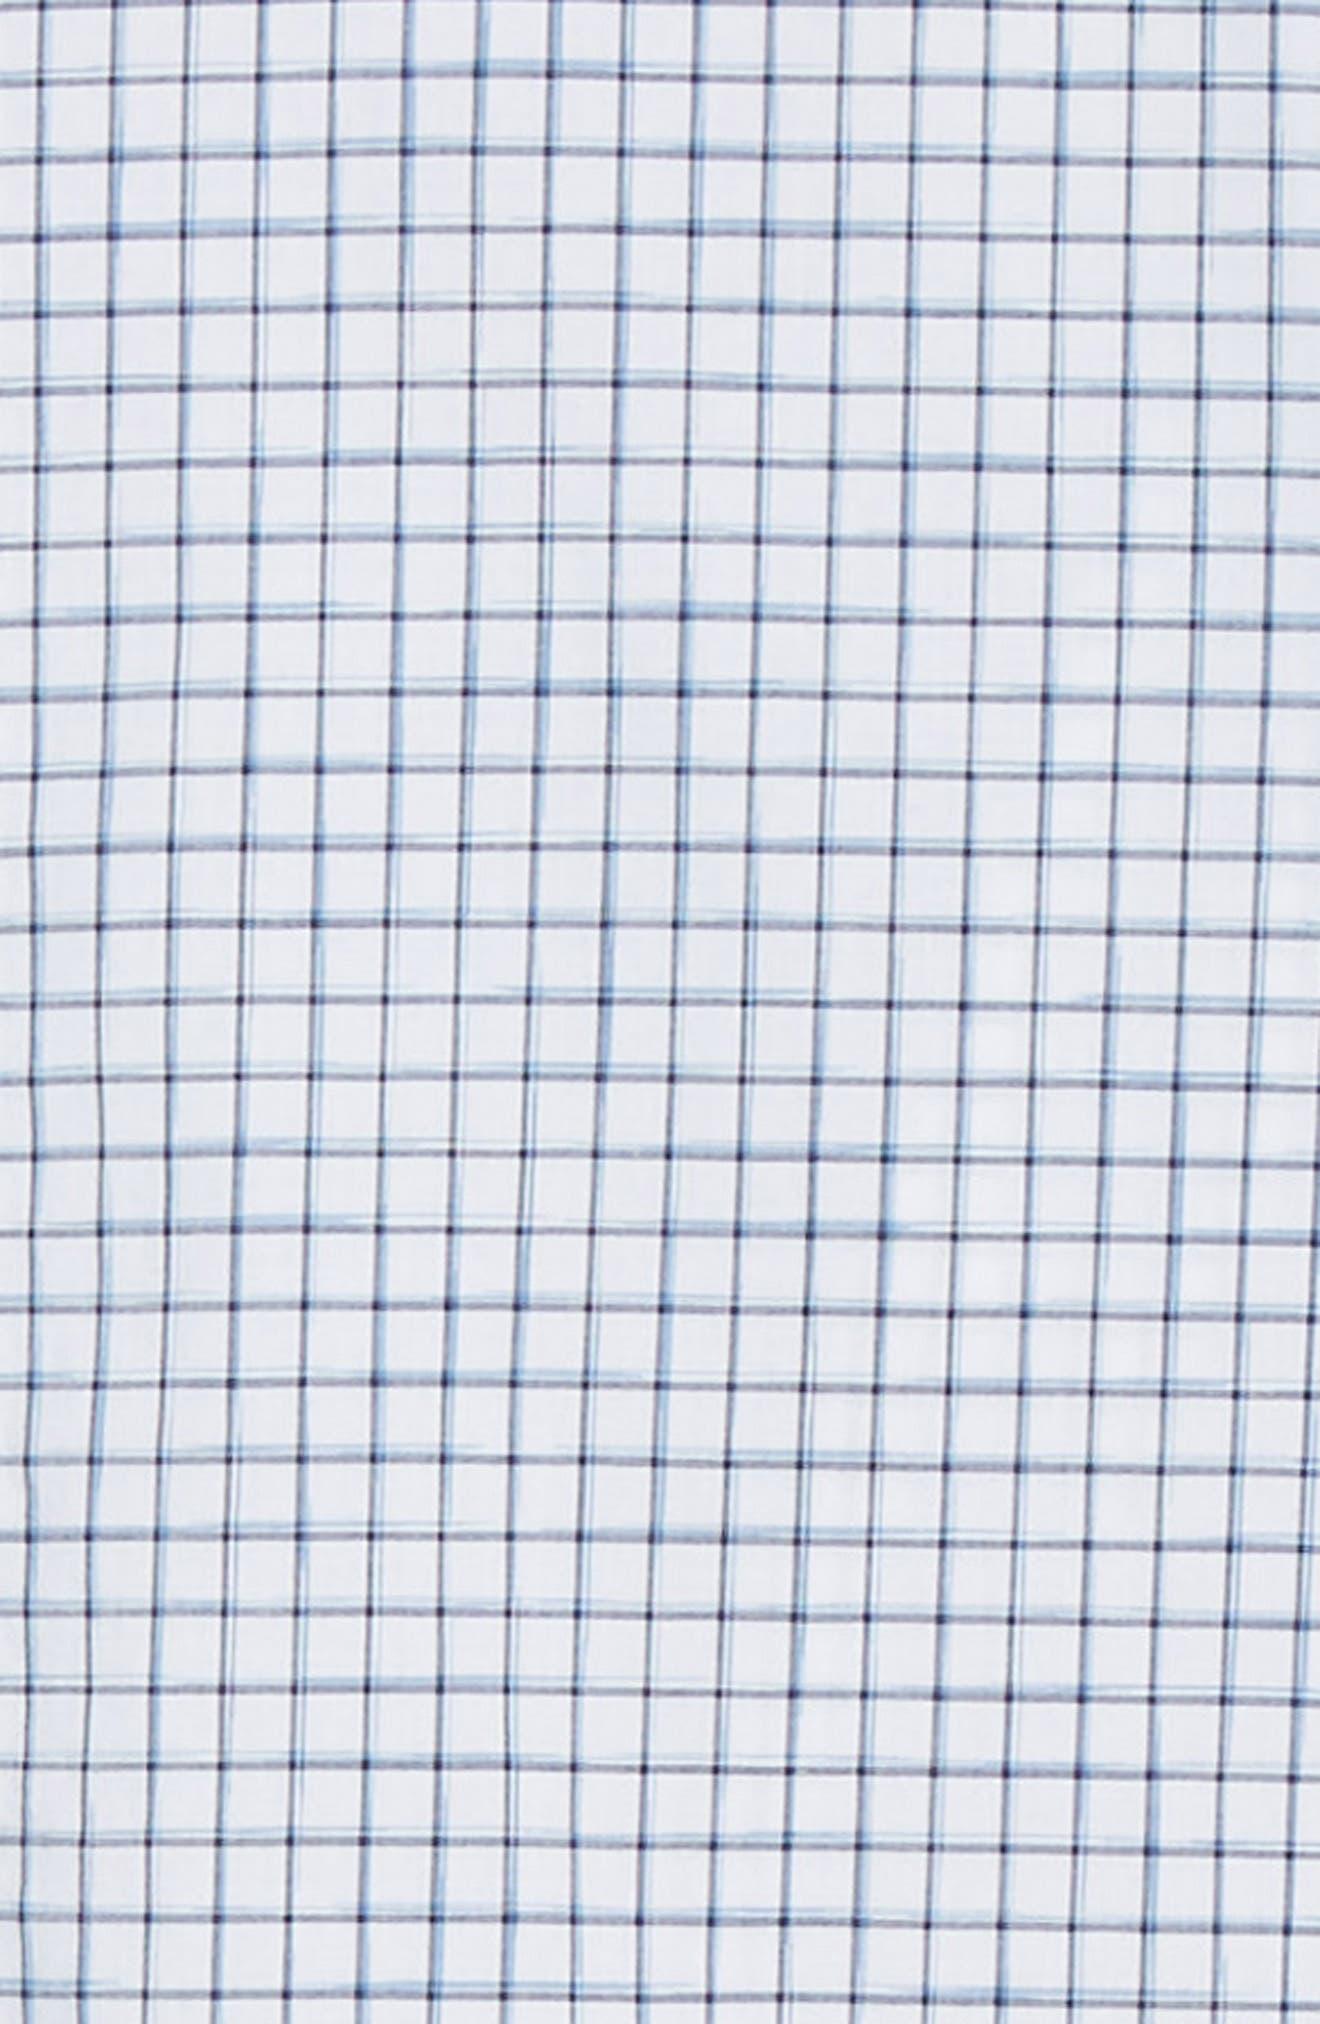 RODD & GUNN, Gowerville Regular Fit Check Sport Shirt, Alternate thumbnail 6, color, SNOW